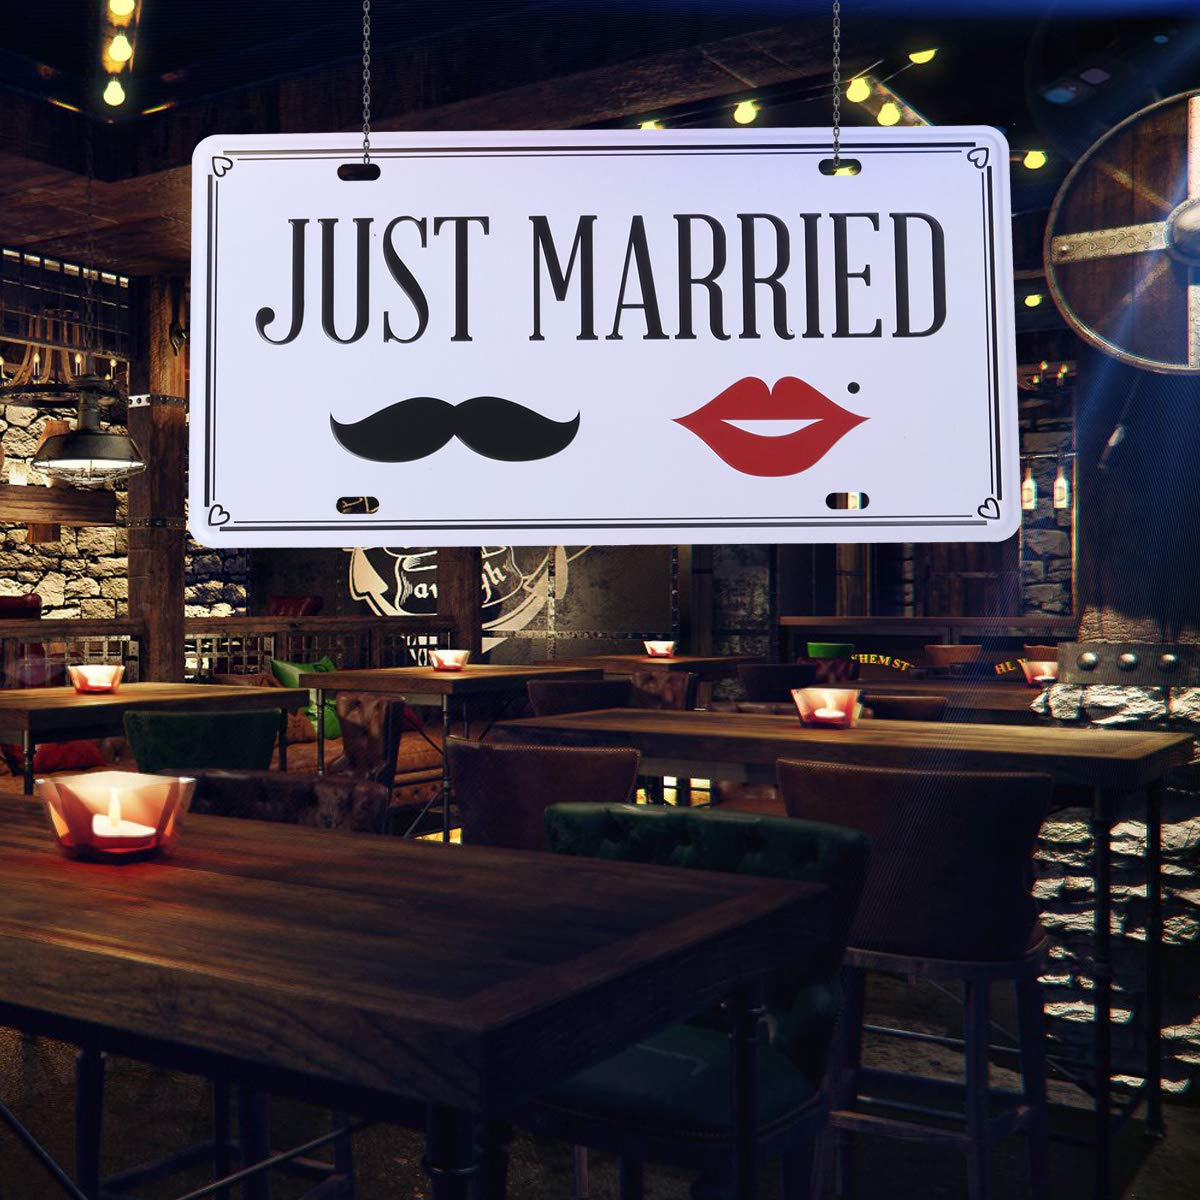 Vosarea Semplice verit/à segni decorativi depoca Tin Metal Iron Car Sign dipinto per la casa Bar Coffee Shop Just Married